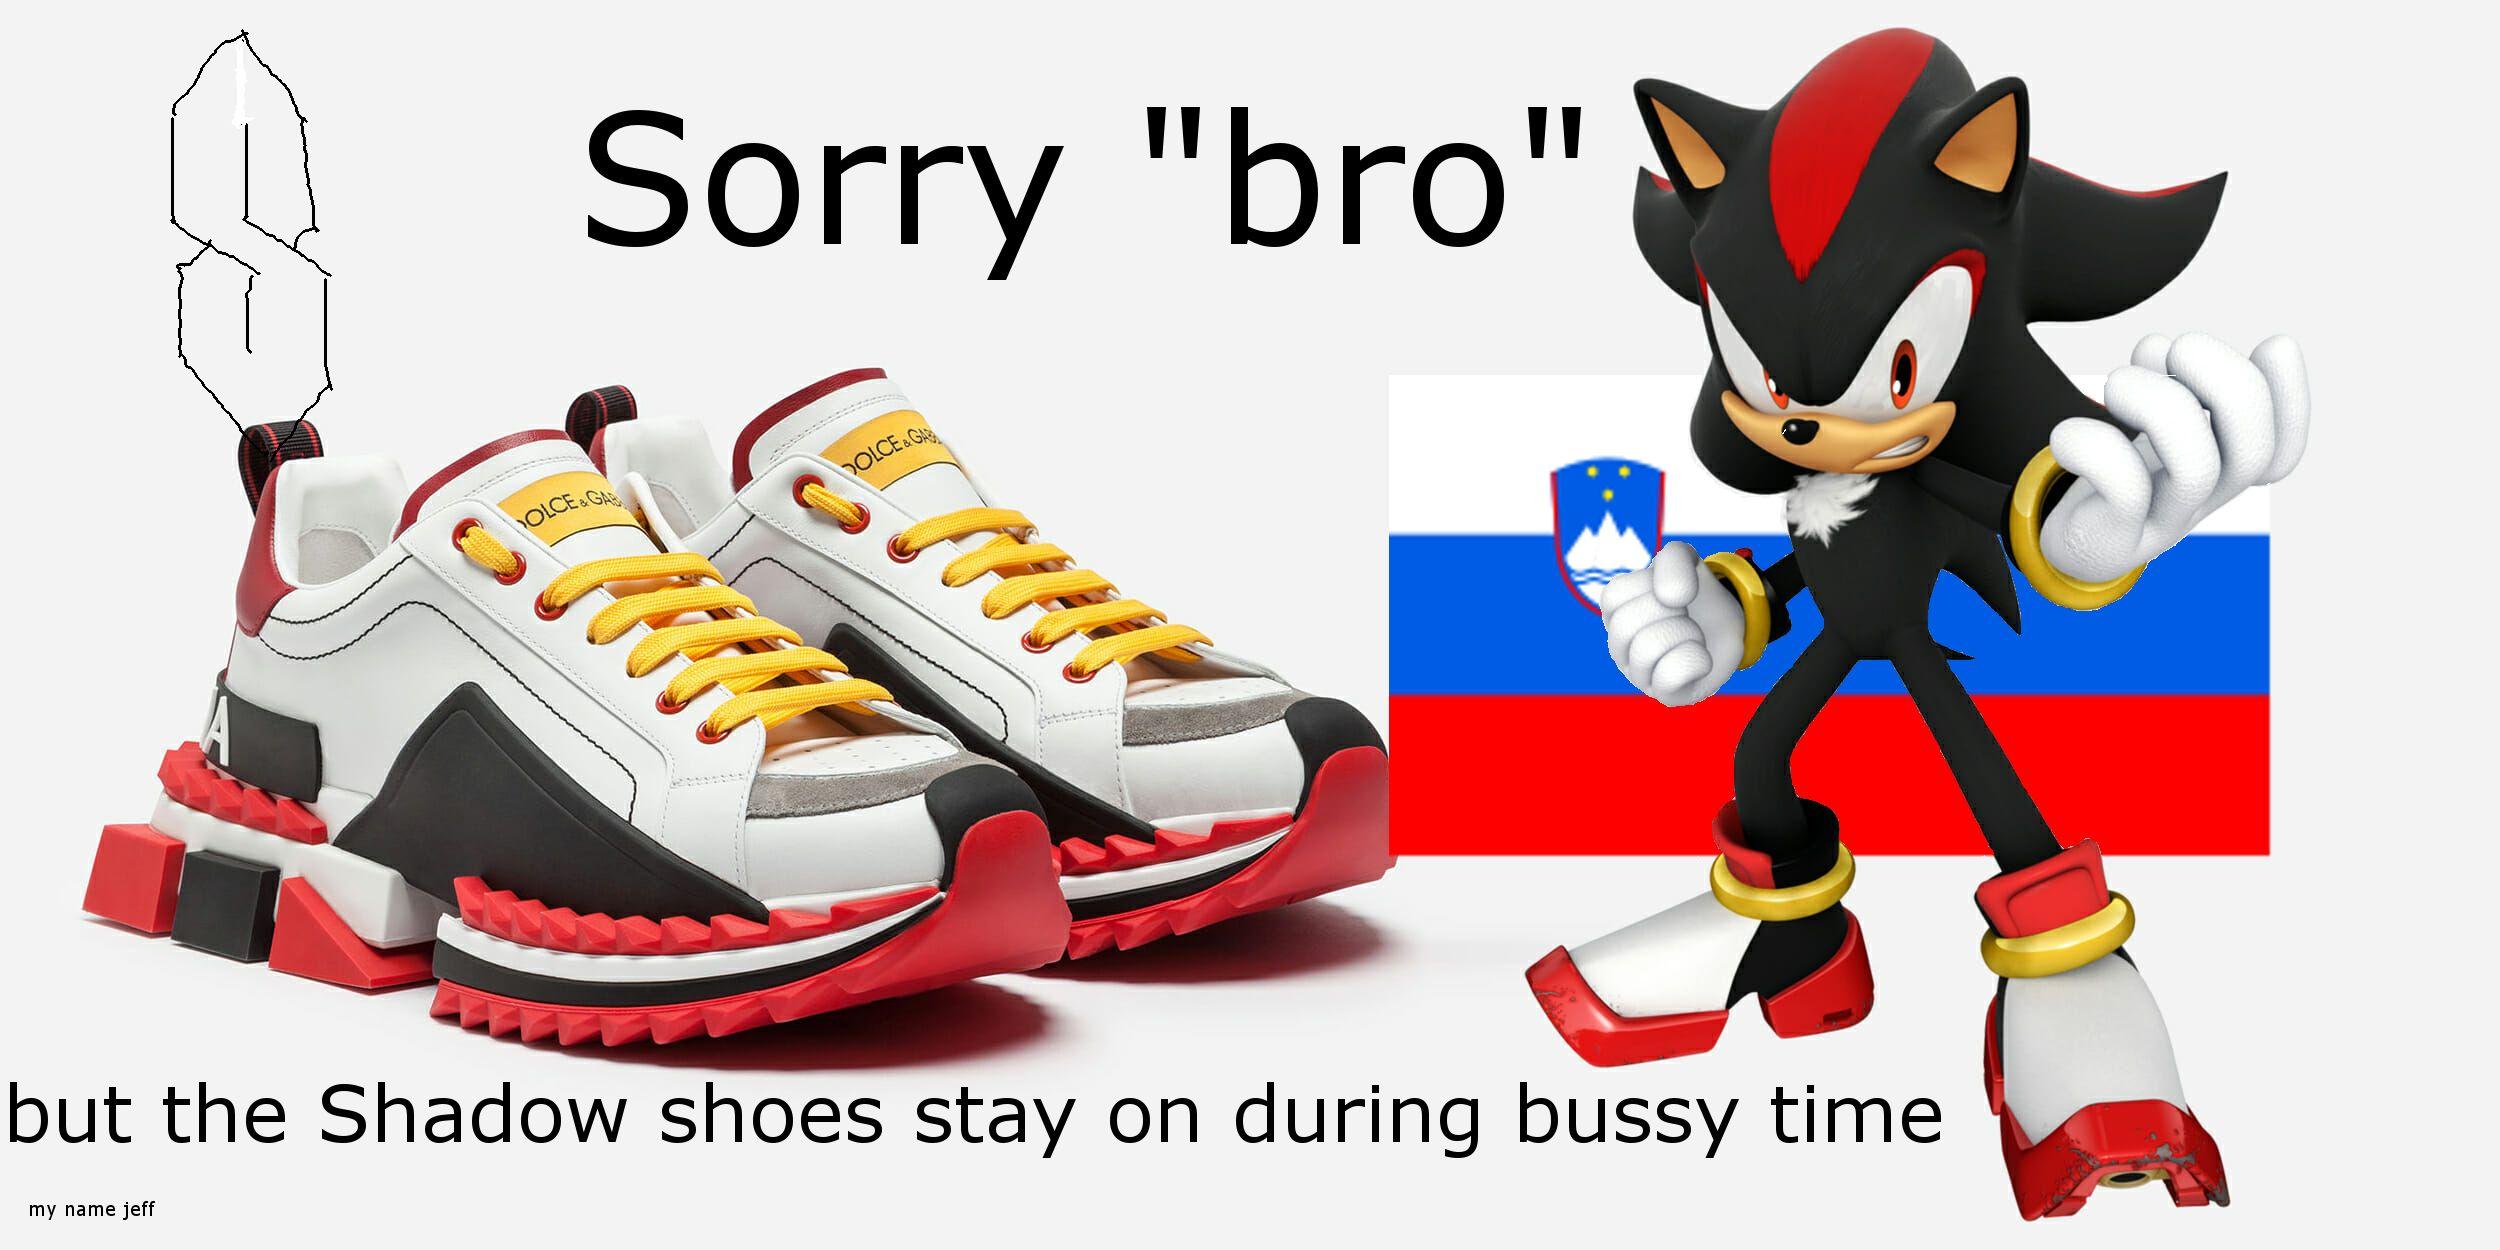 [OC] it's a meme you dip